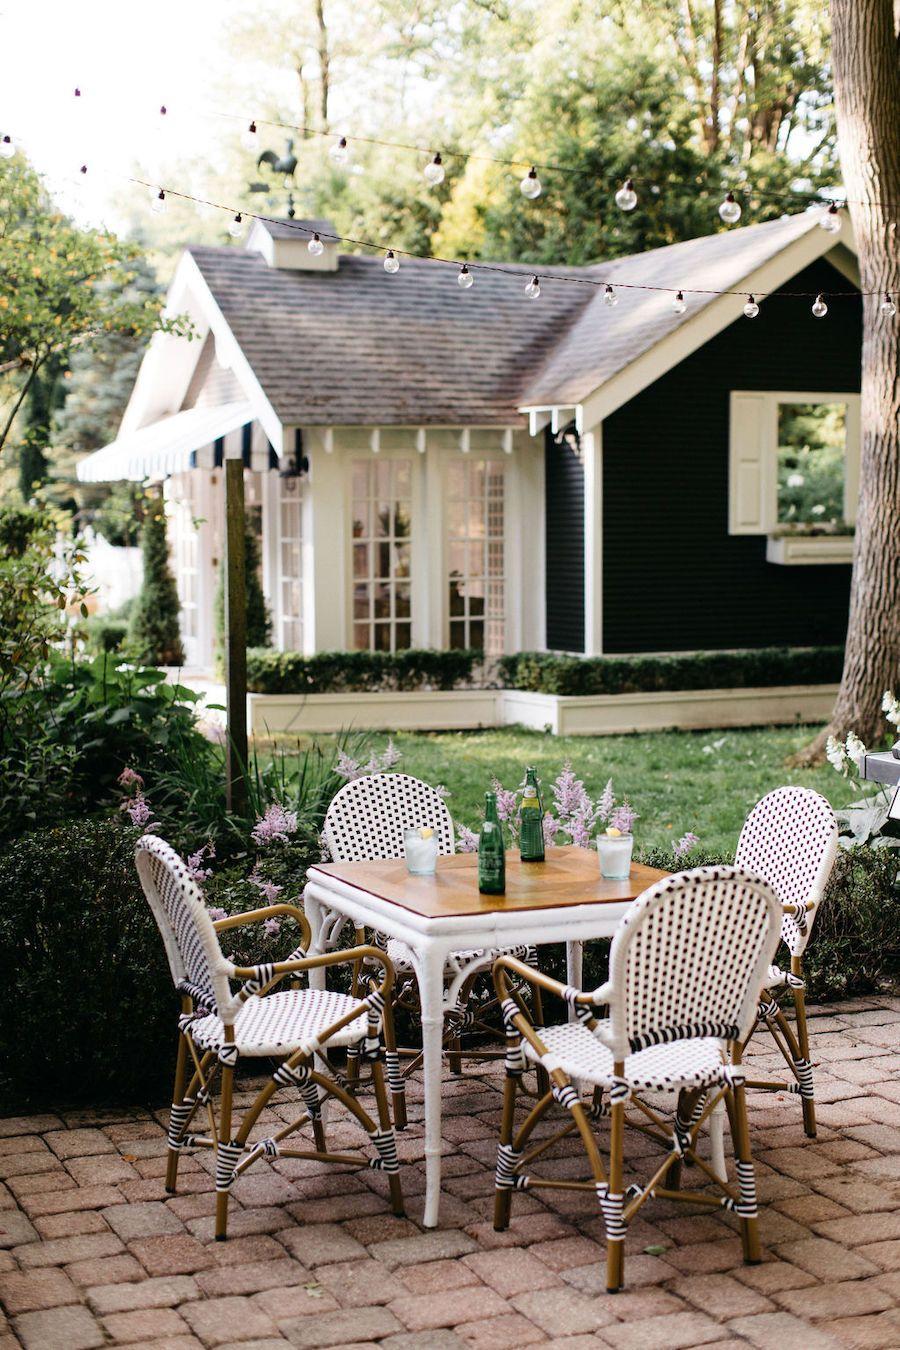 10 Stunning Vacation Rentals To Book Now Patio Outdoor Outdoor